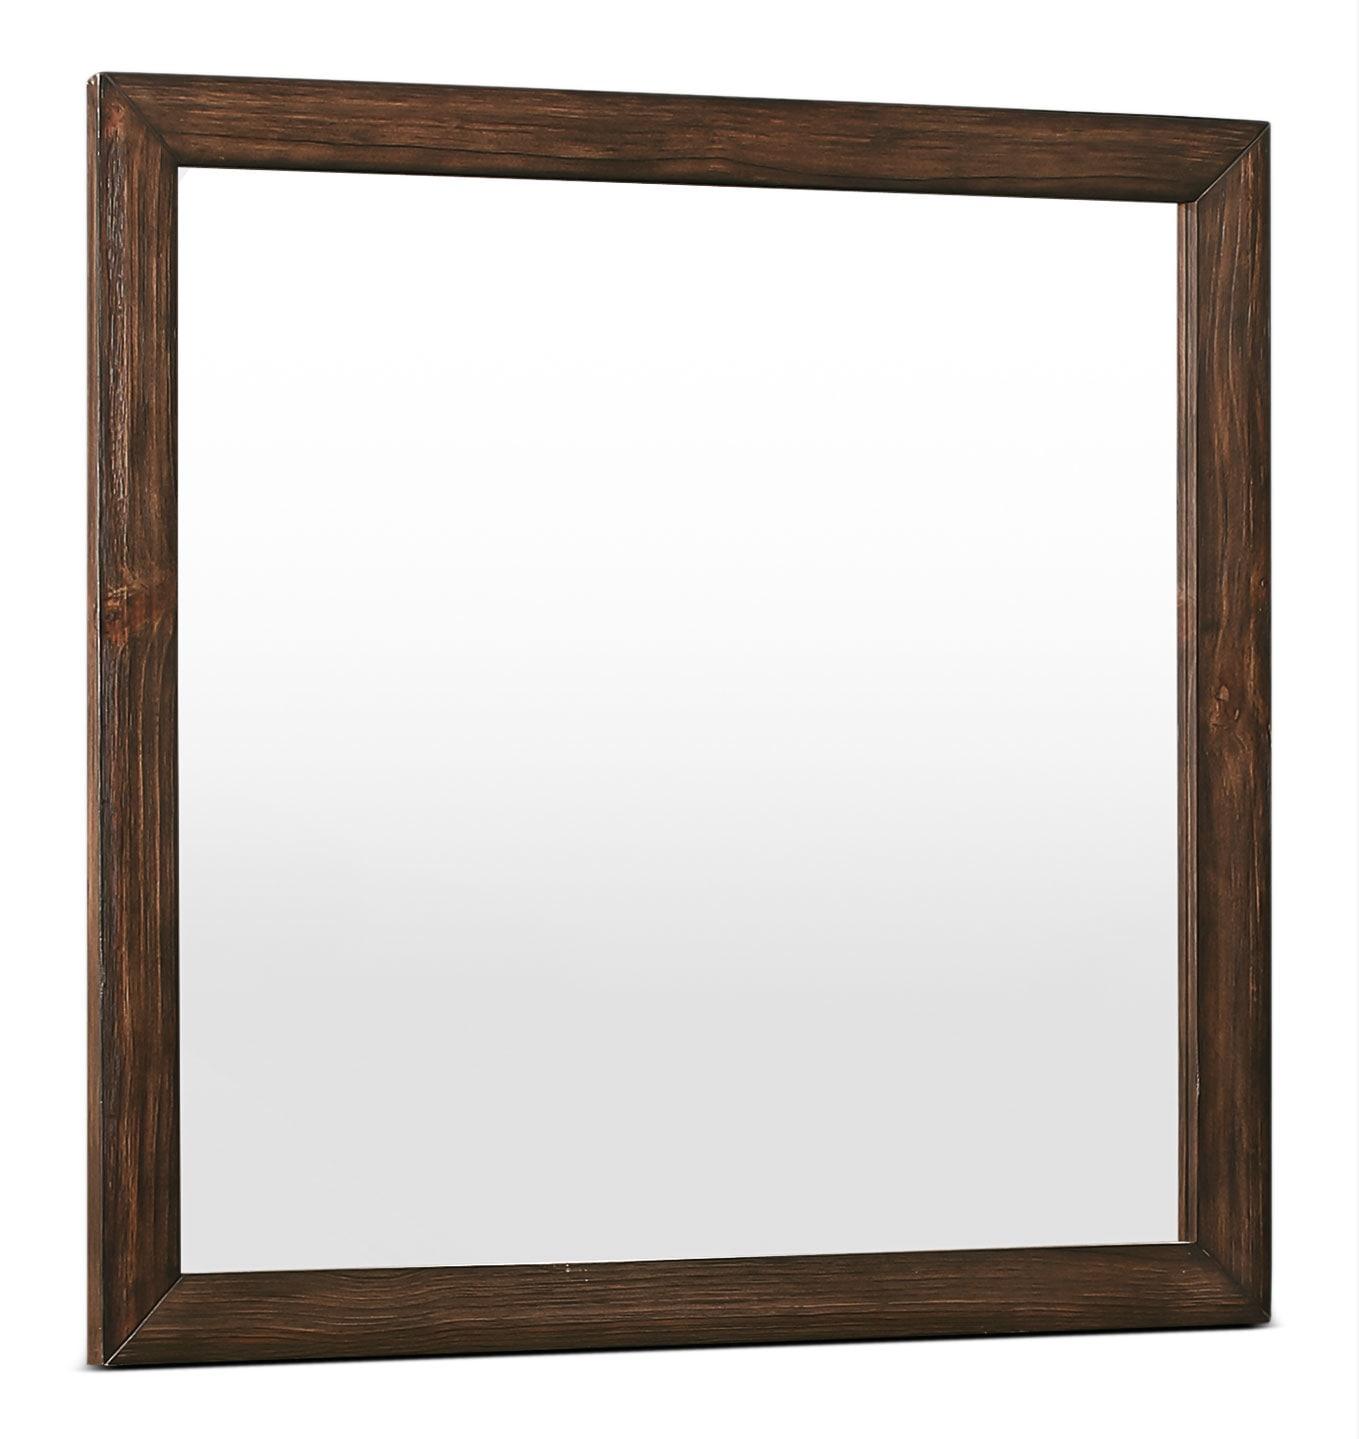 Bedroom Furniture - Tacoma Mirror